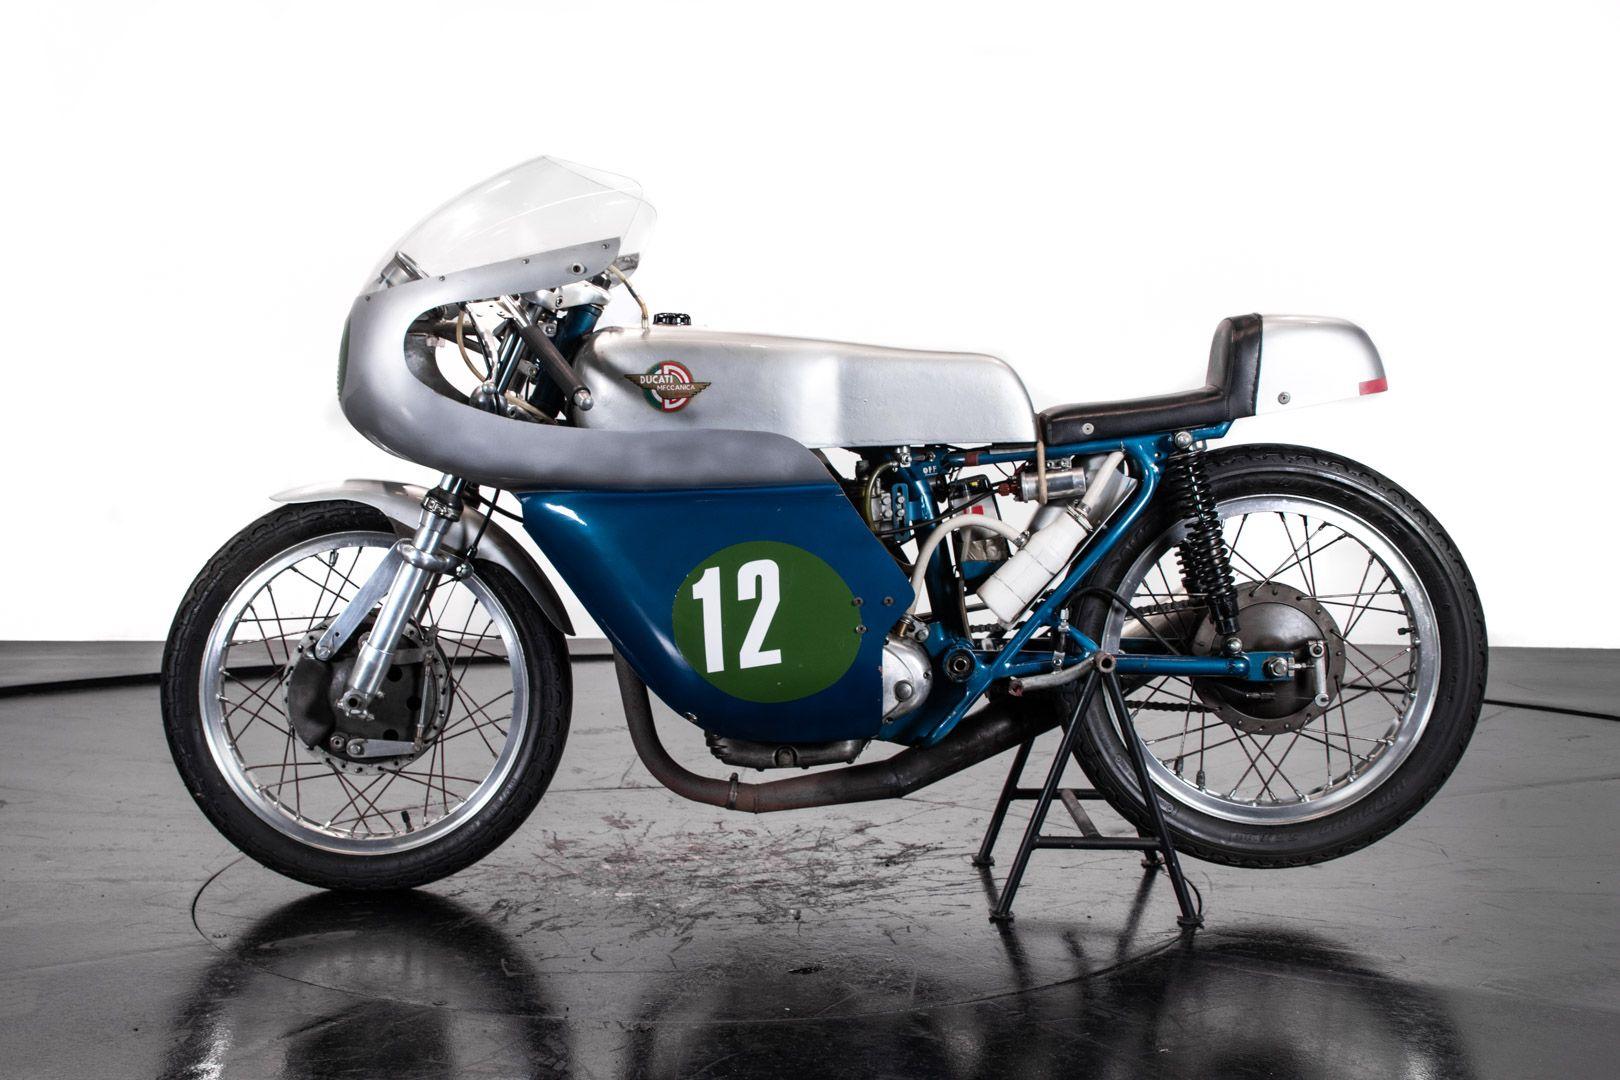 1960 Ducati Mach 1 Corsa NCR 82189